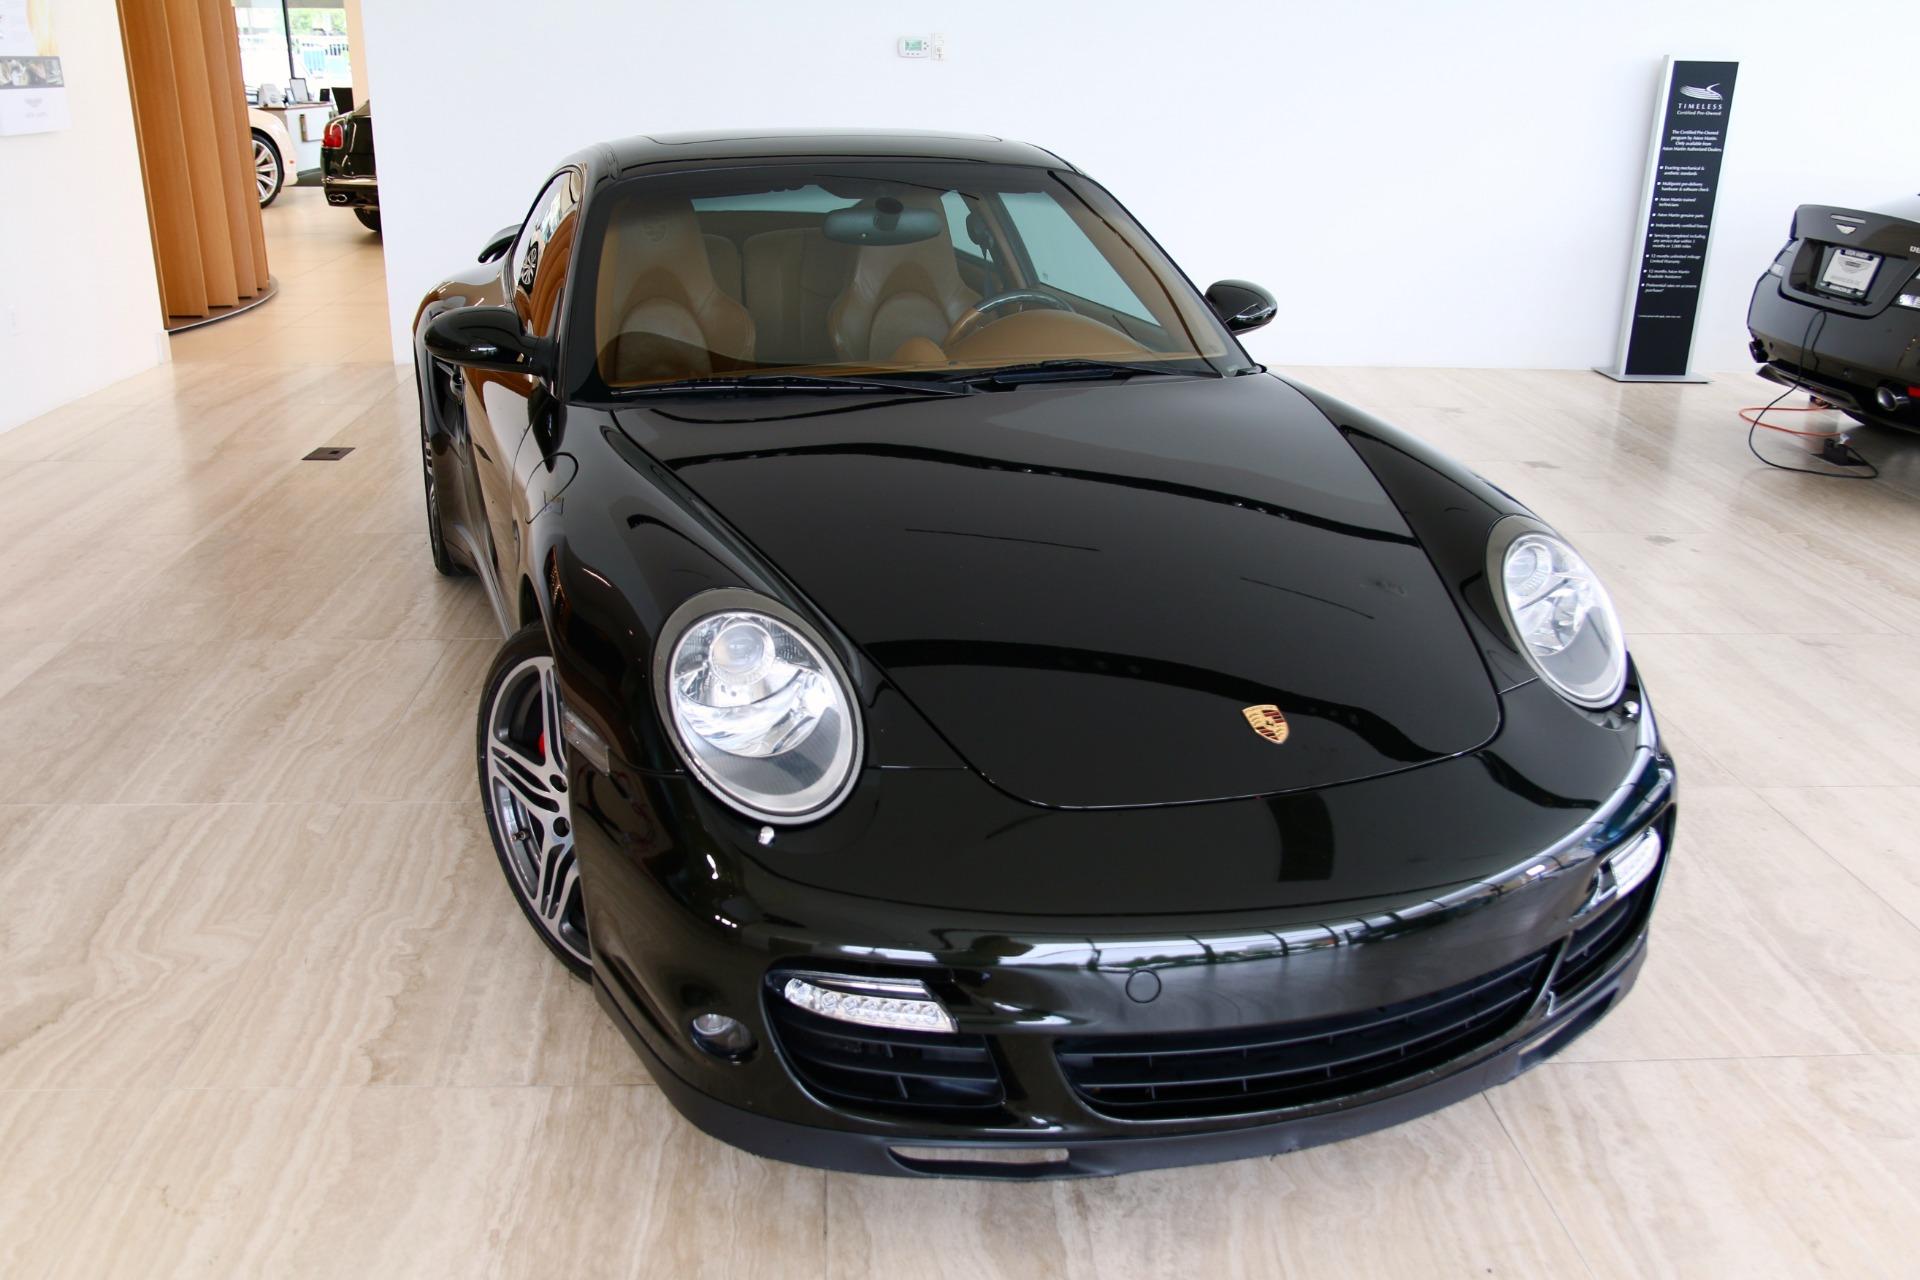 2007 Porsche 911 Turbo Stock # P84457 for sale near Vienna, VA | VA